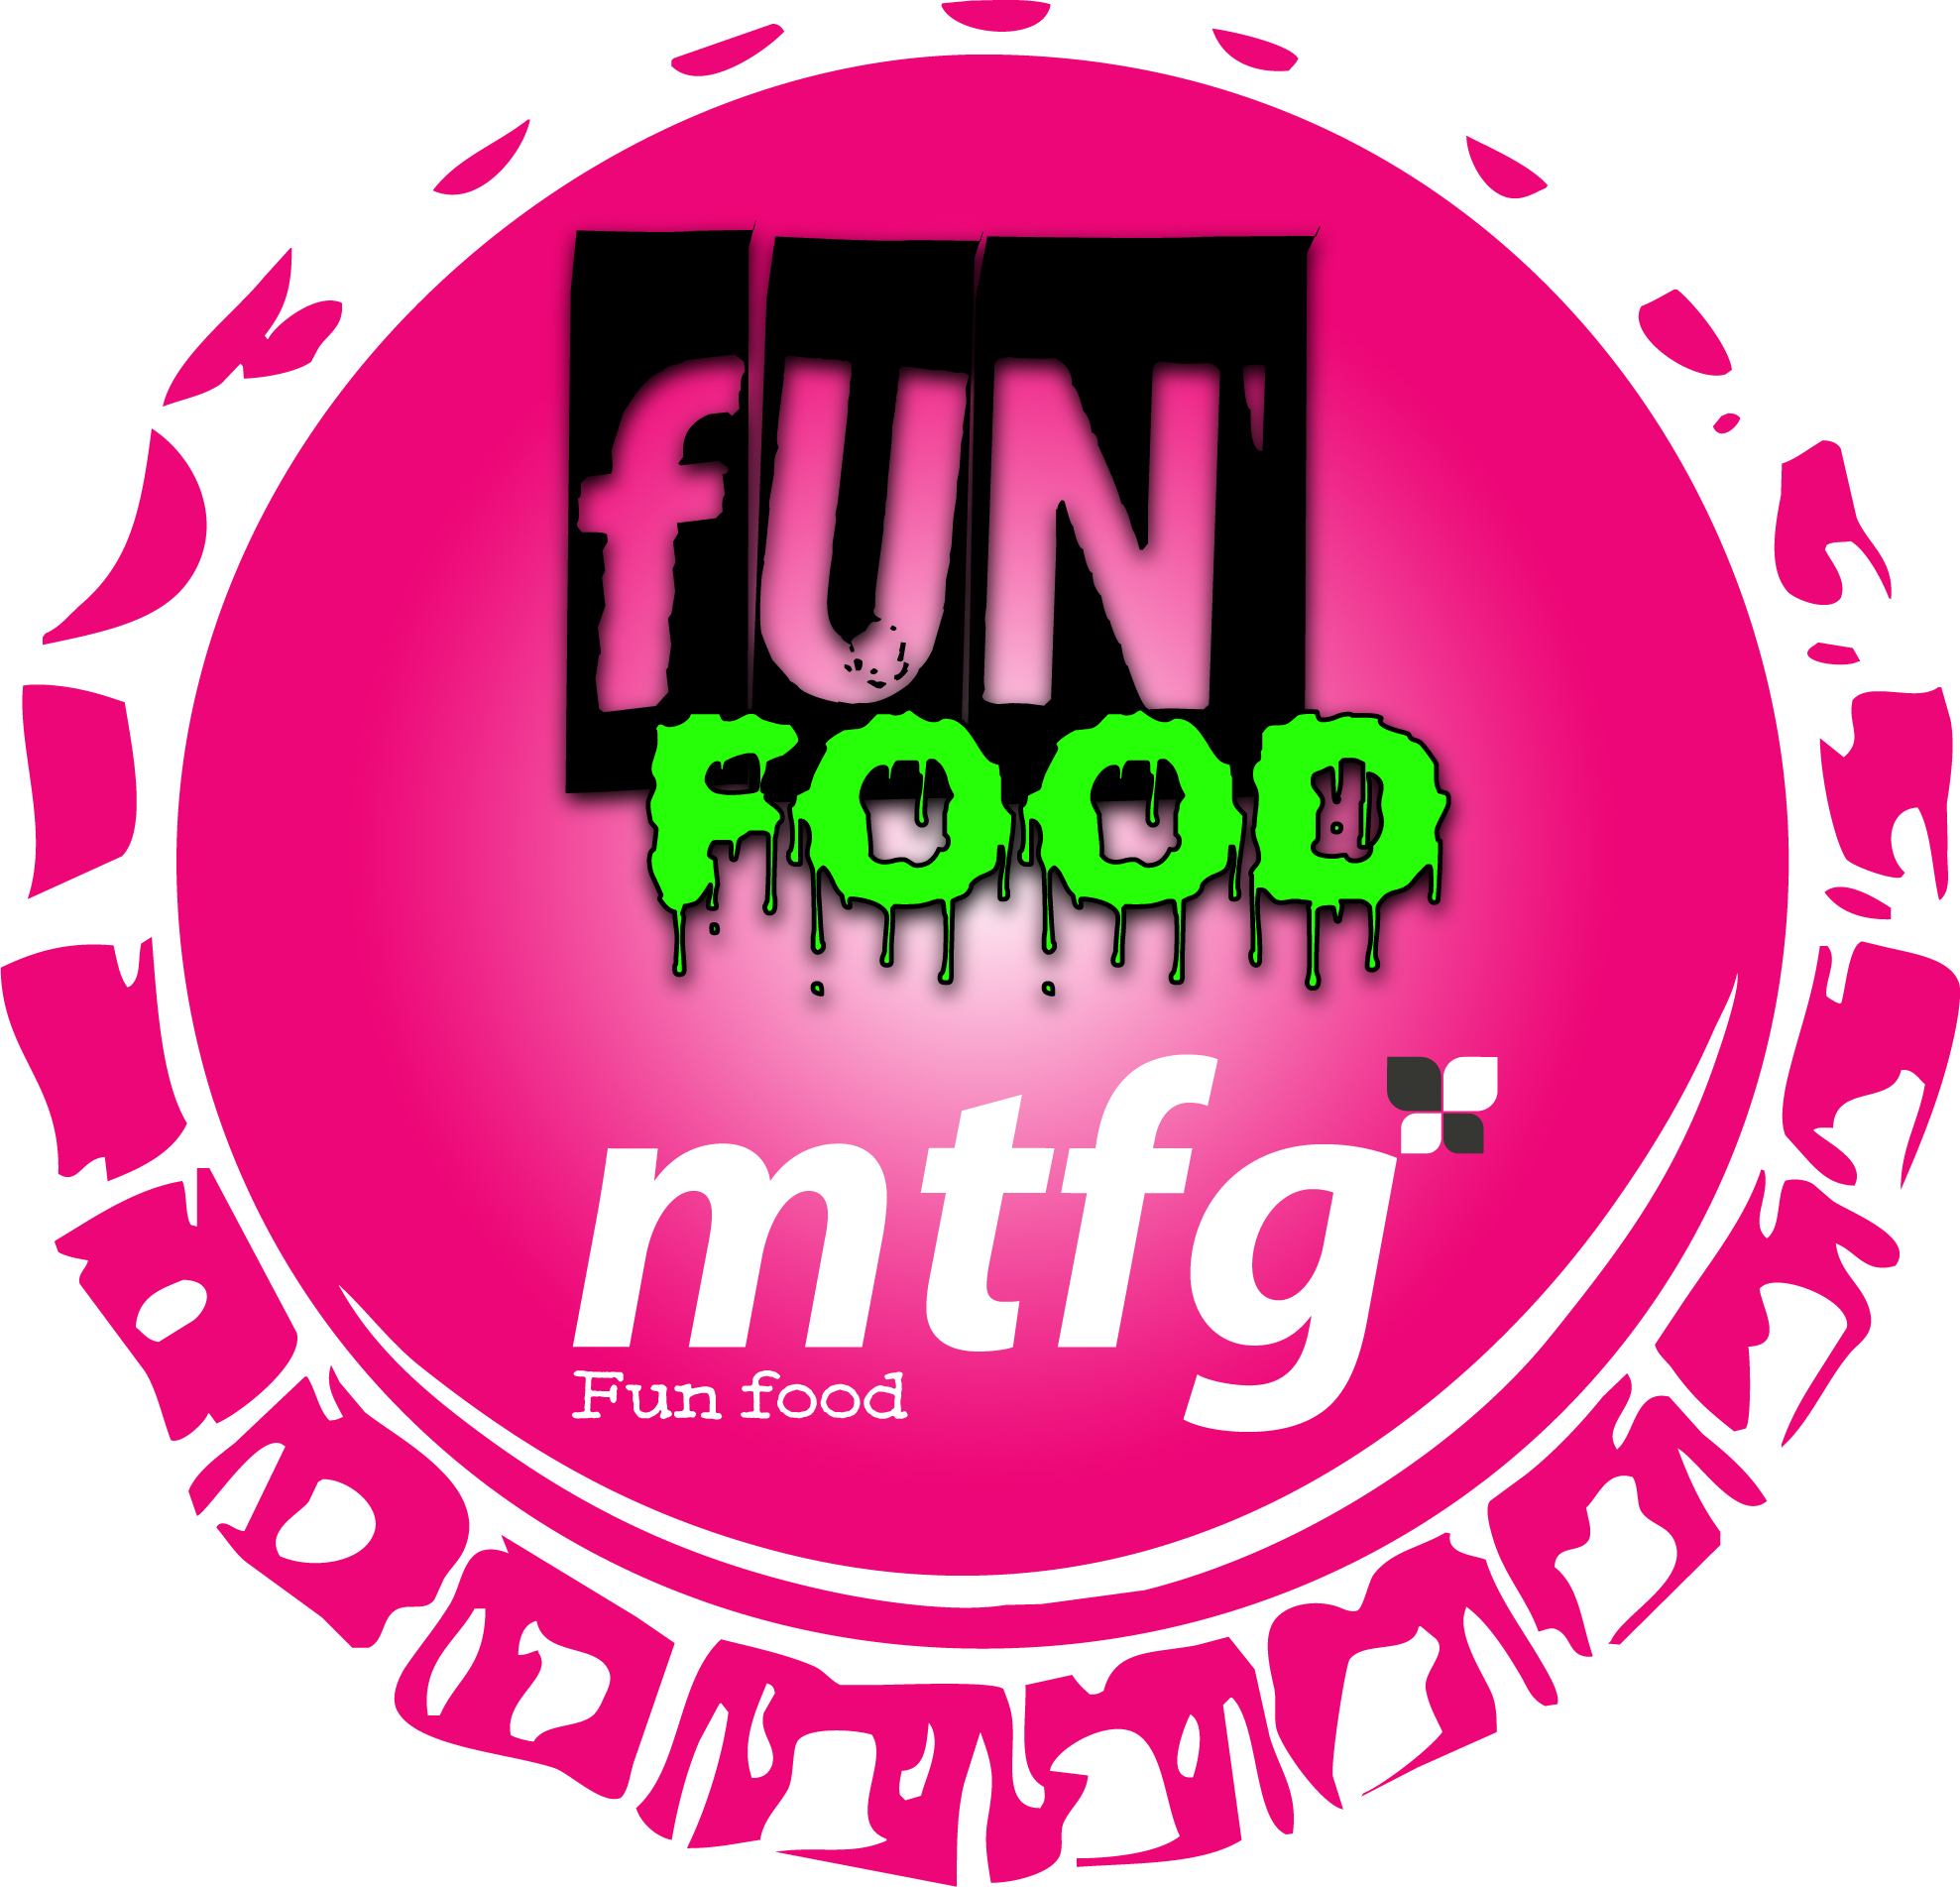 MTFG Fun food